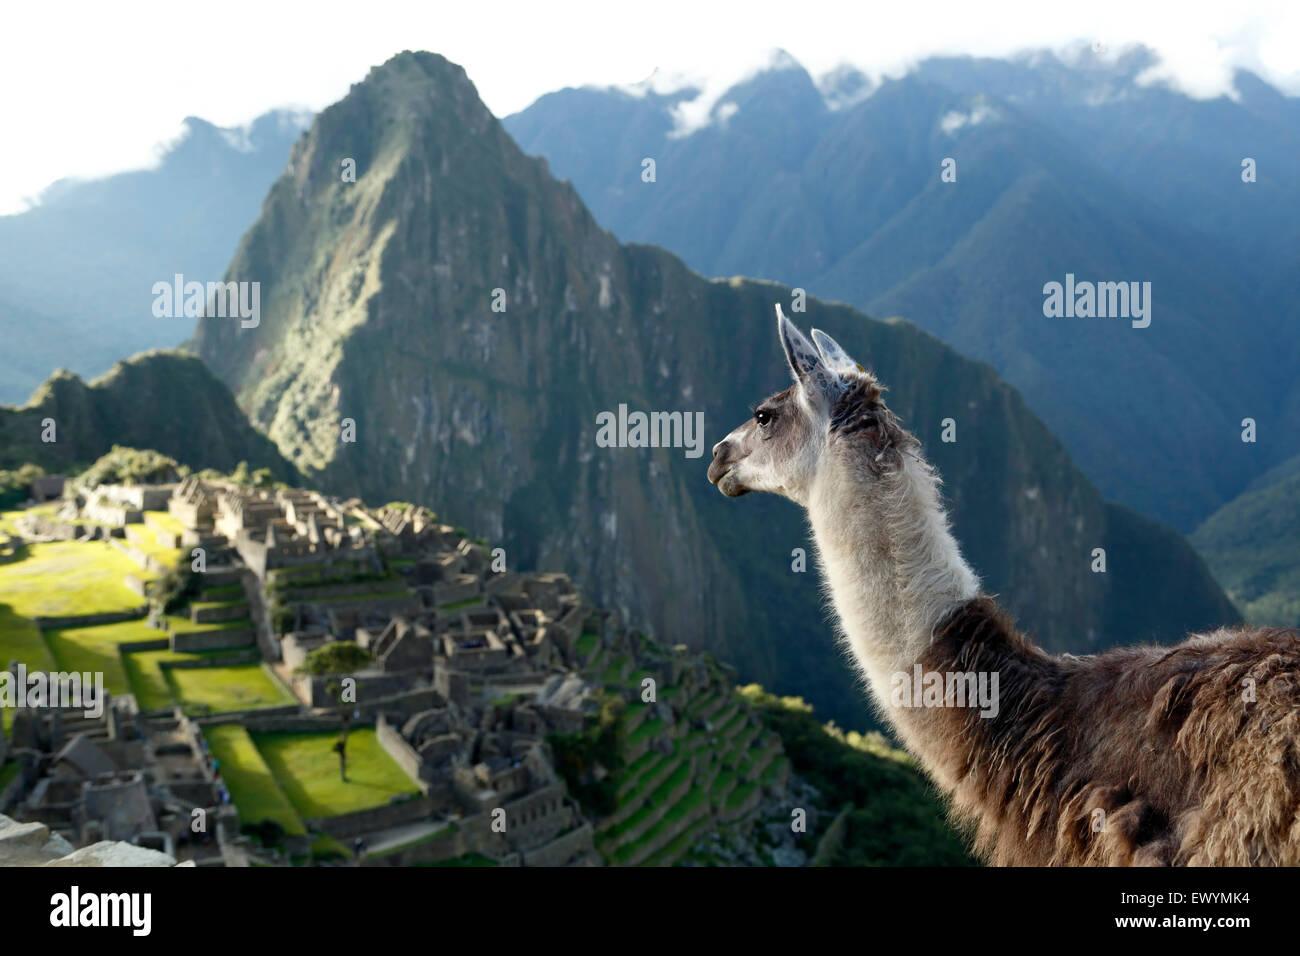 Le lama (Lama glama) ruines Inca et Machu Picchu, près de Machupicchu Pueblo (Aguas Calientes), Cusco, Pérou Photo Stock